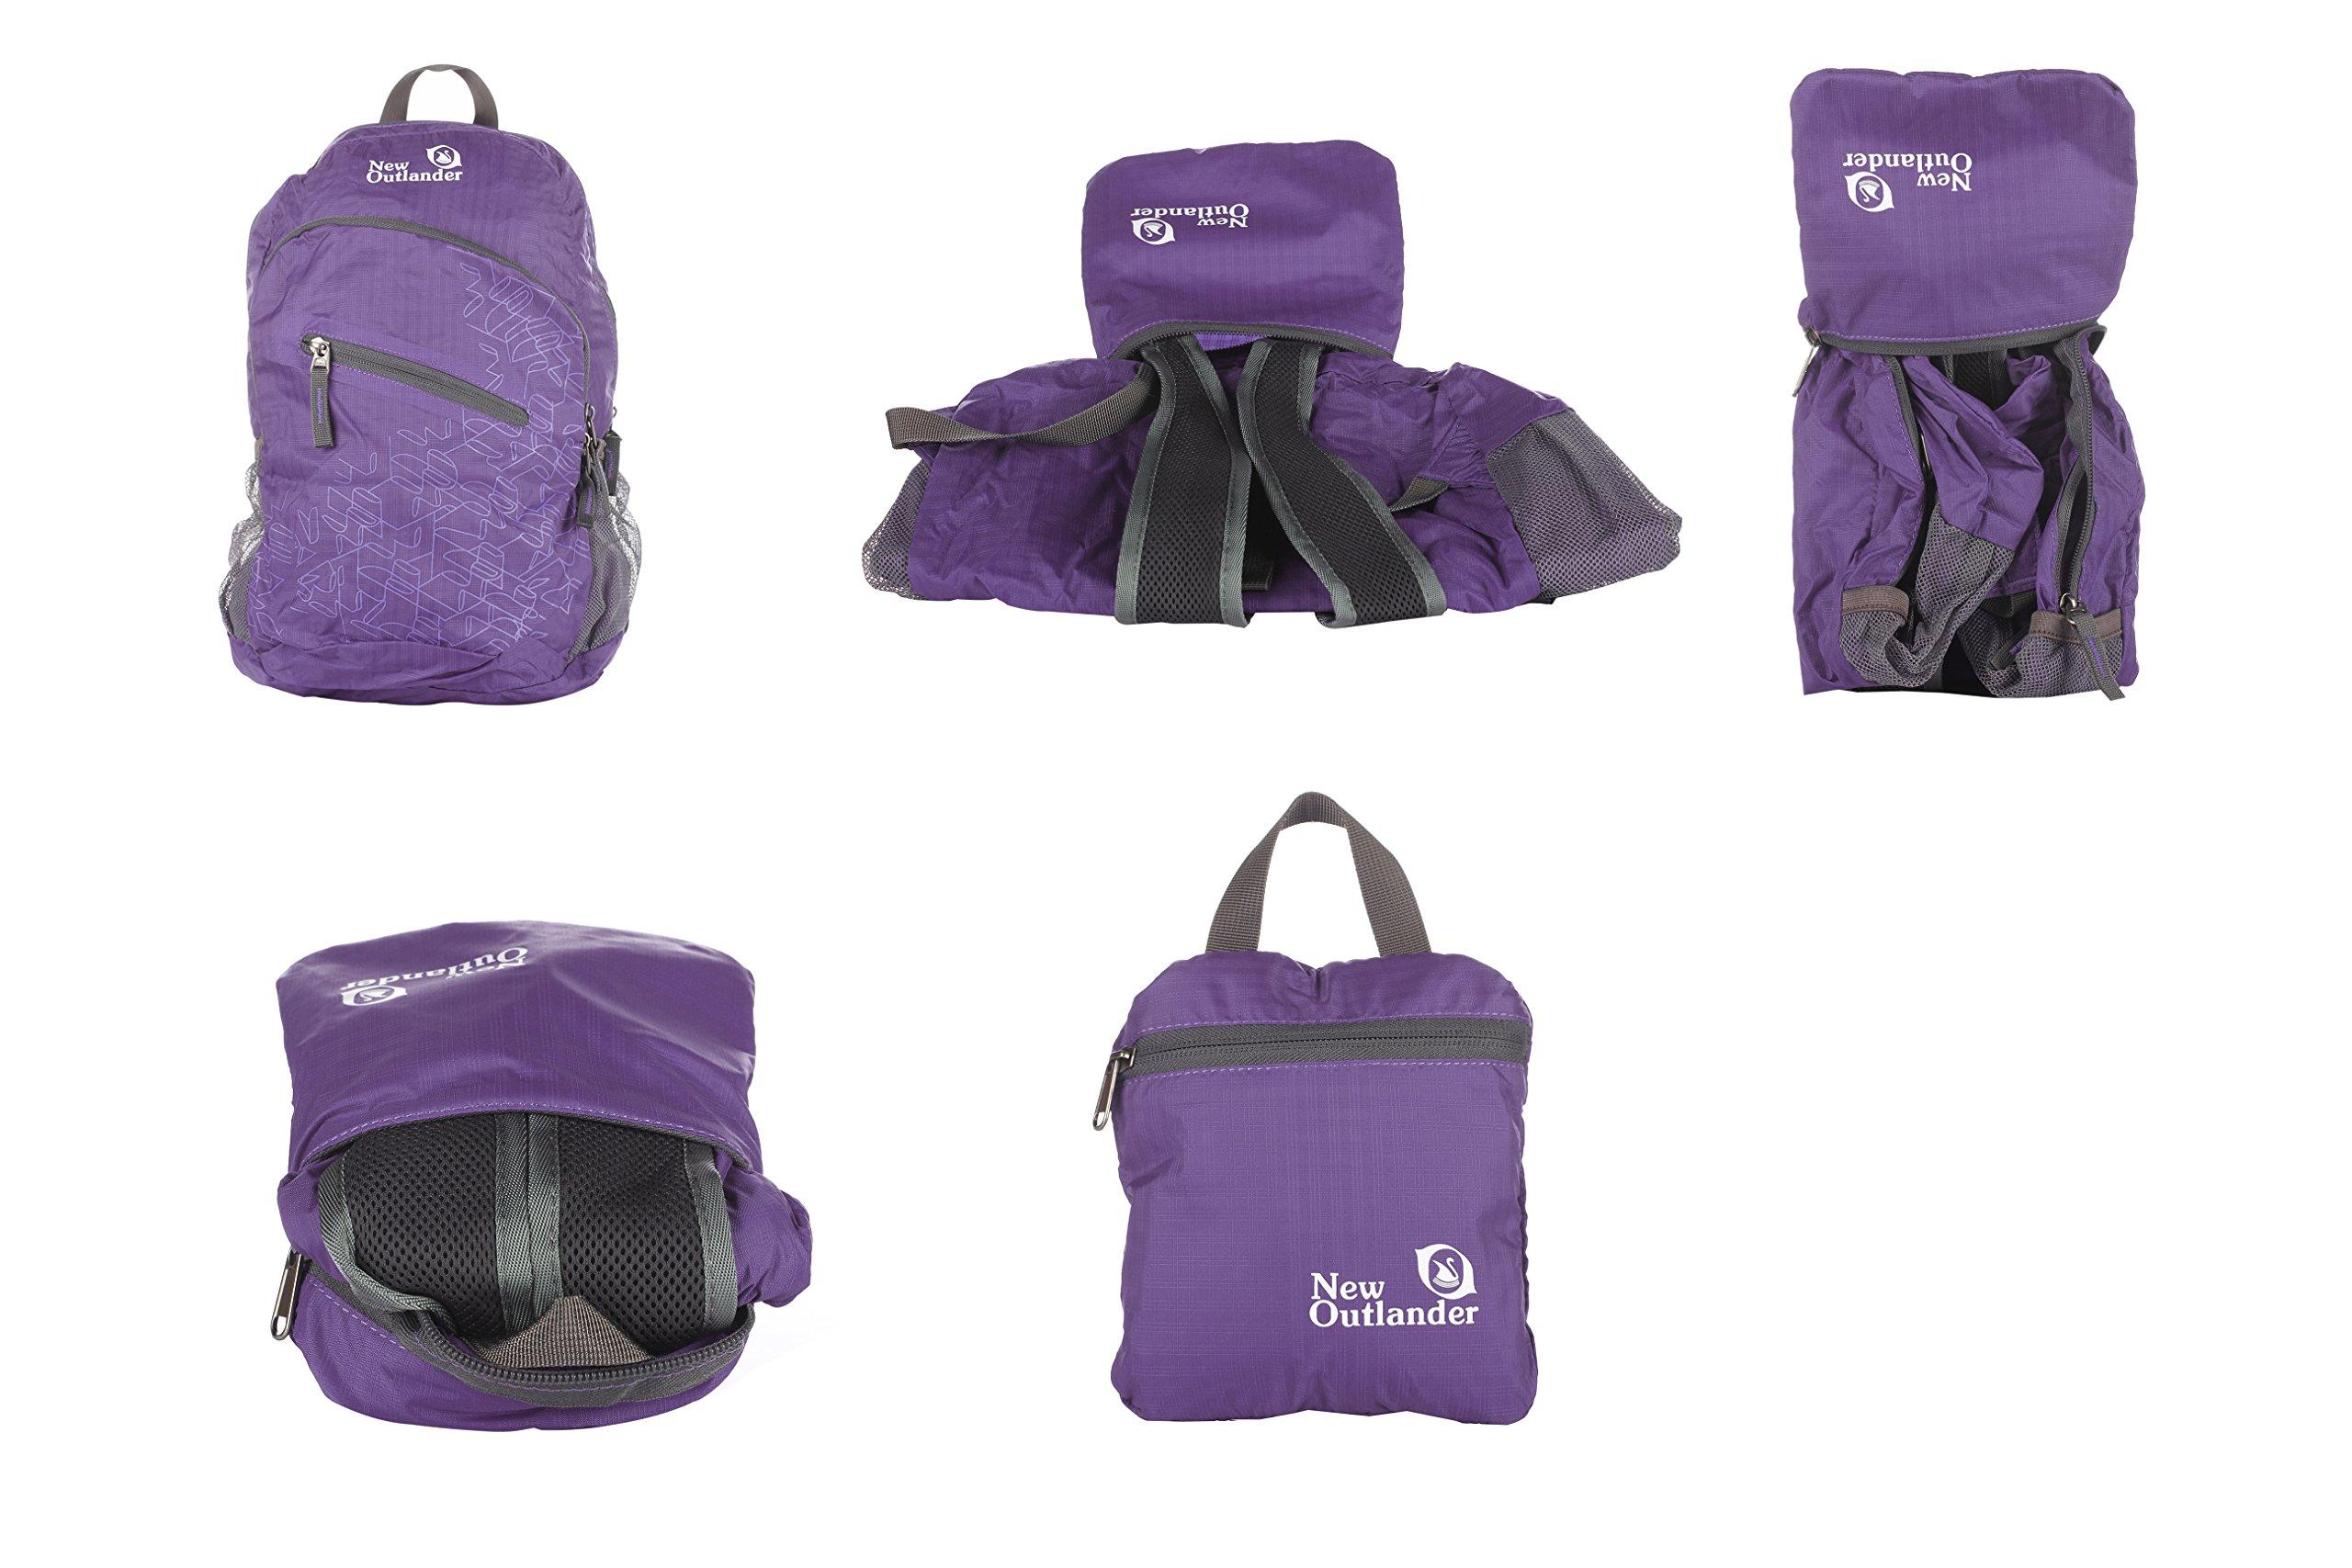 Outlander Packable Handy Lightweight Travel Hiking Backpack Daypack-Purple-L by Outlander (Image #5)